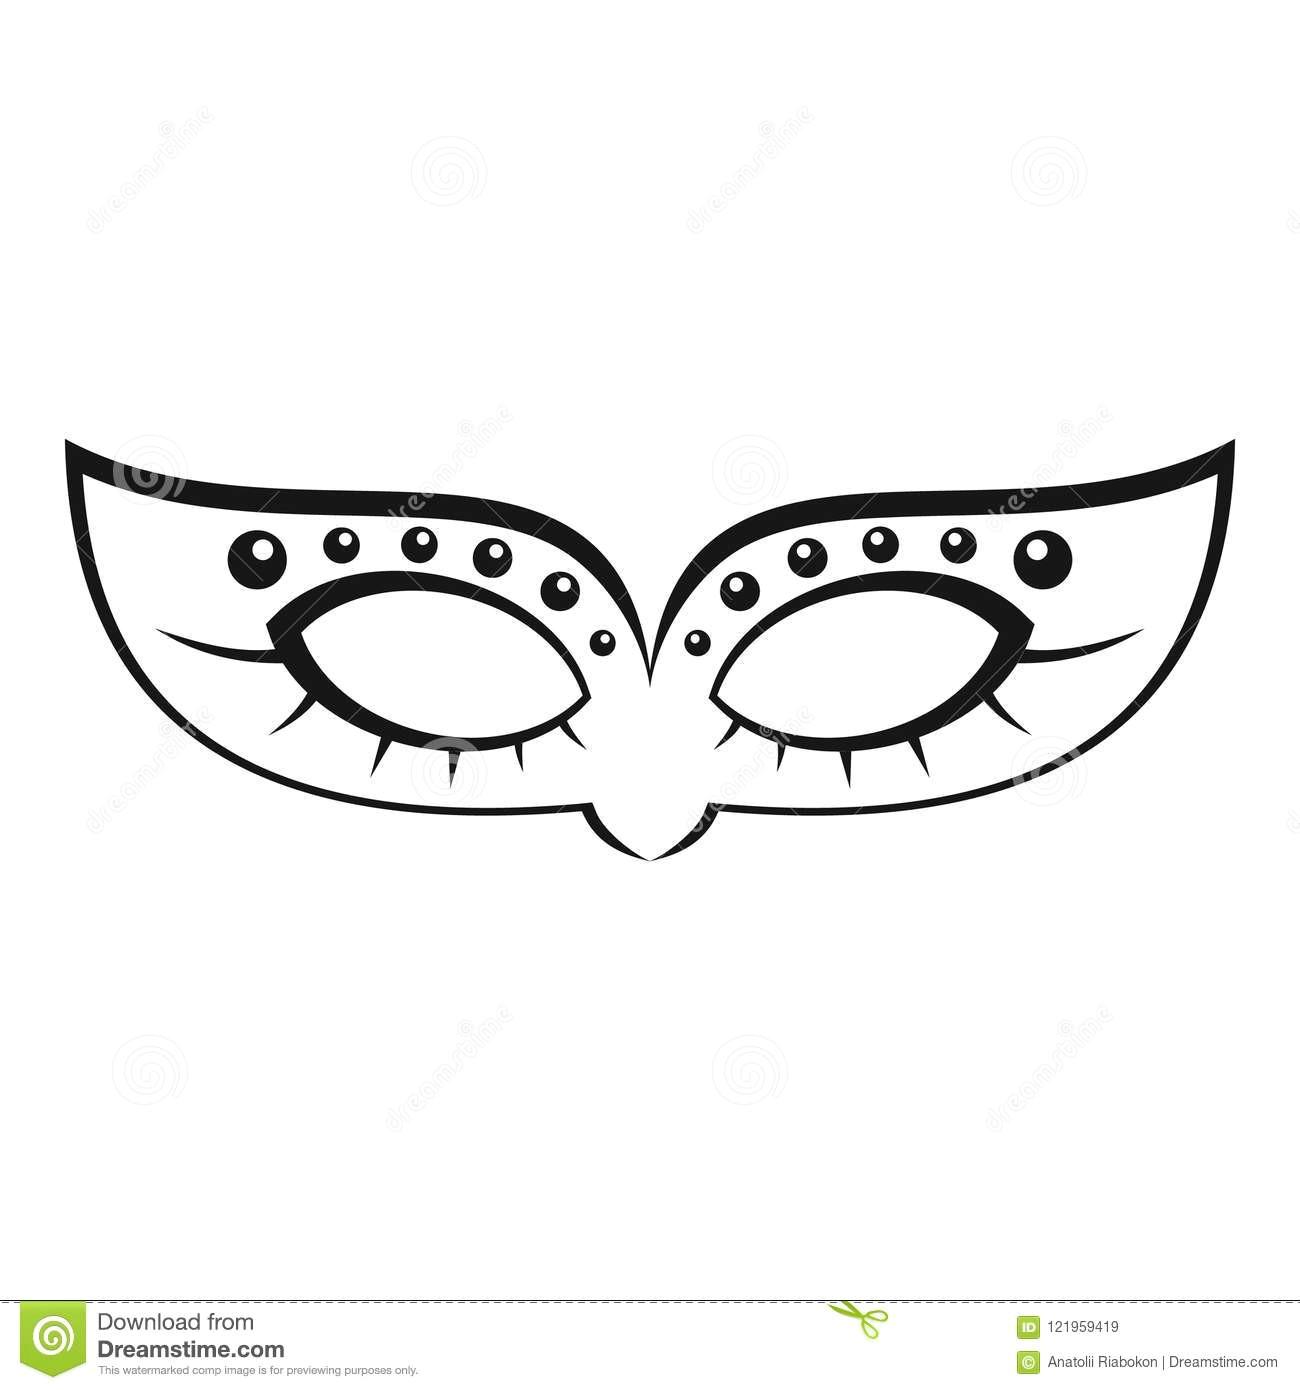 mardi carnival mask icon simple style mardi carnival mask icon simple illustration mardi carnival mask vector icon web 121959419 jpg